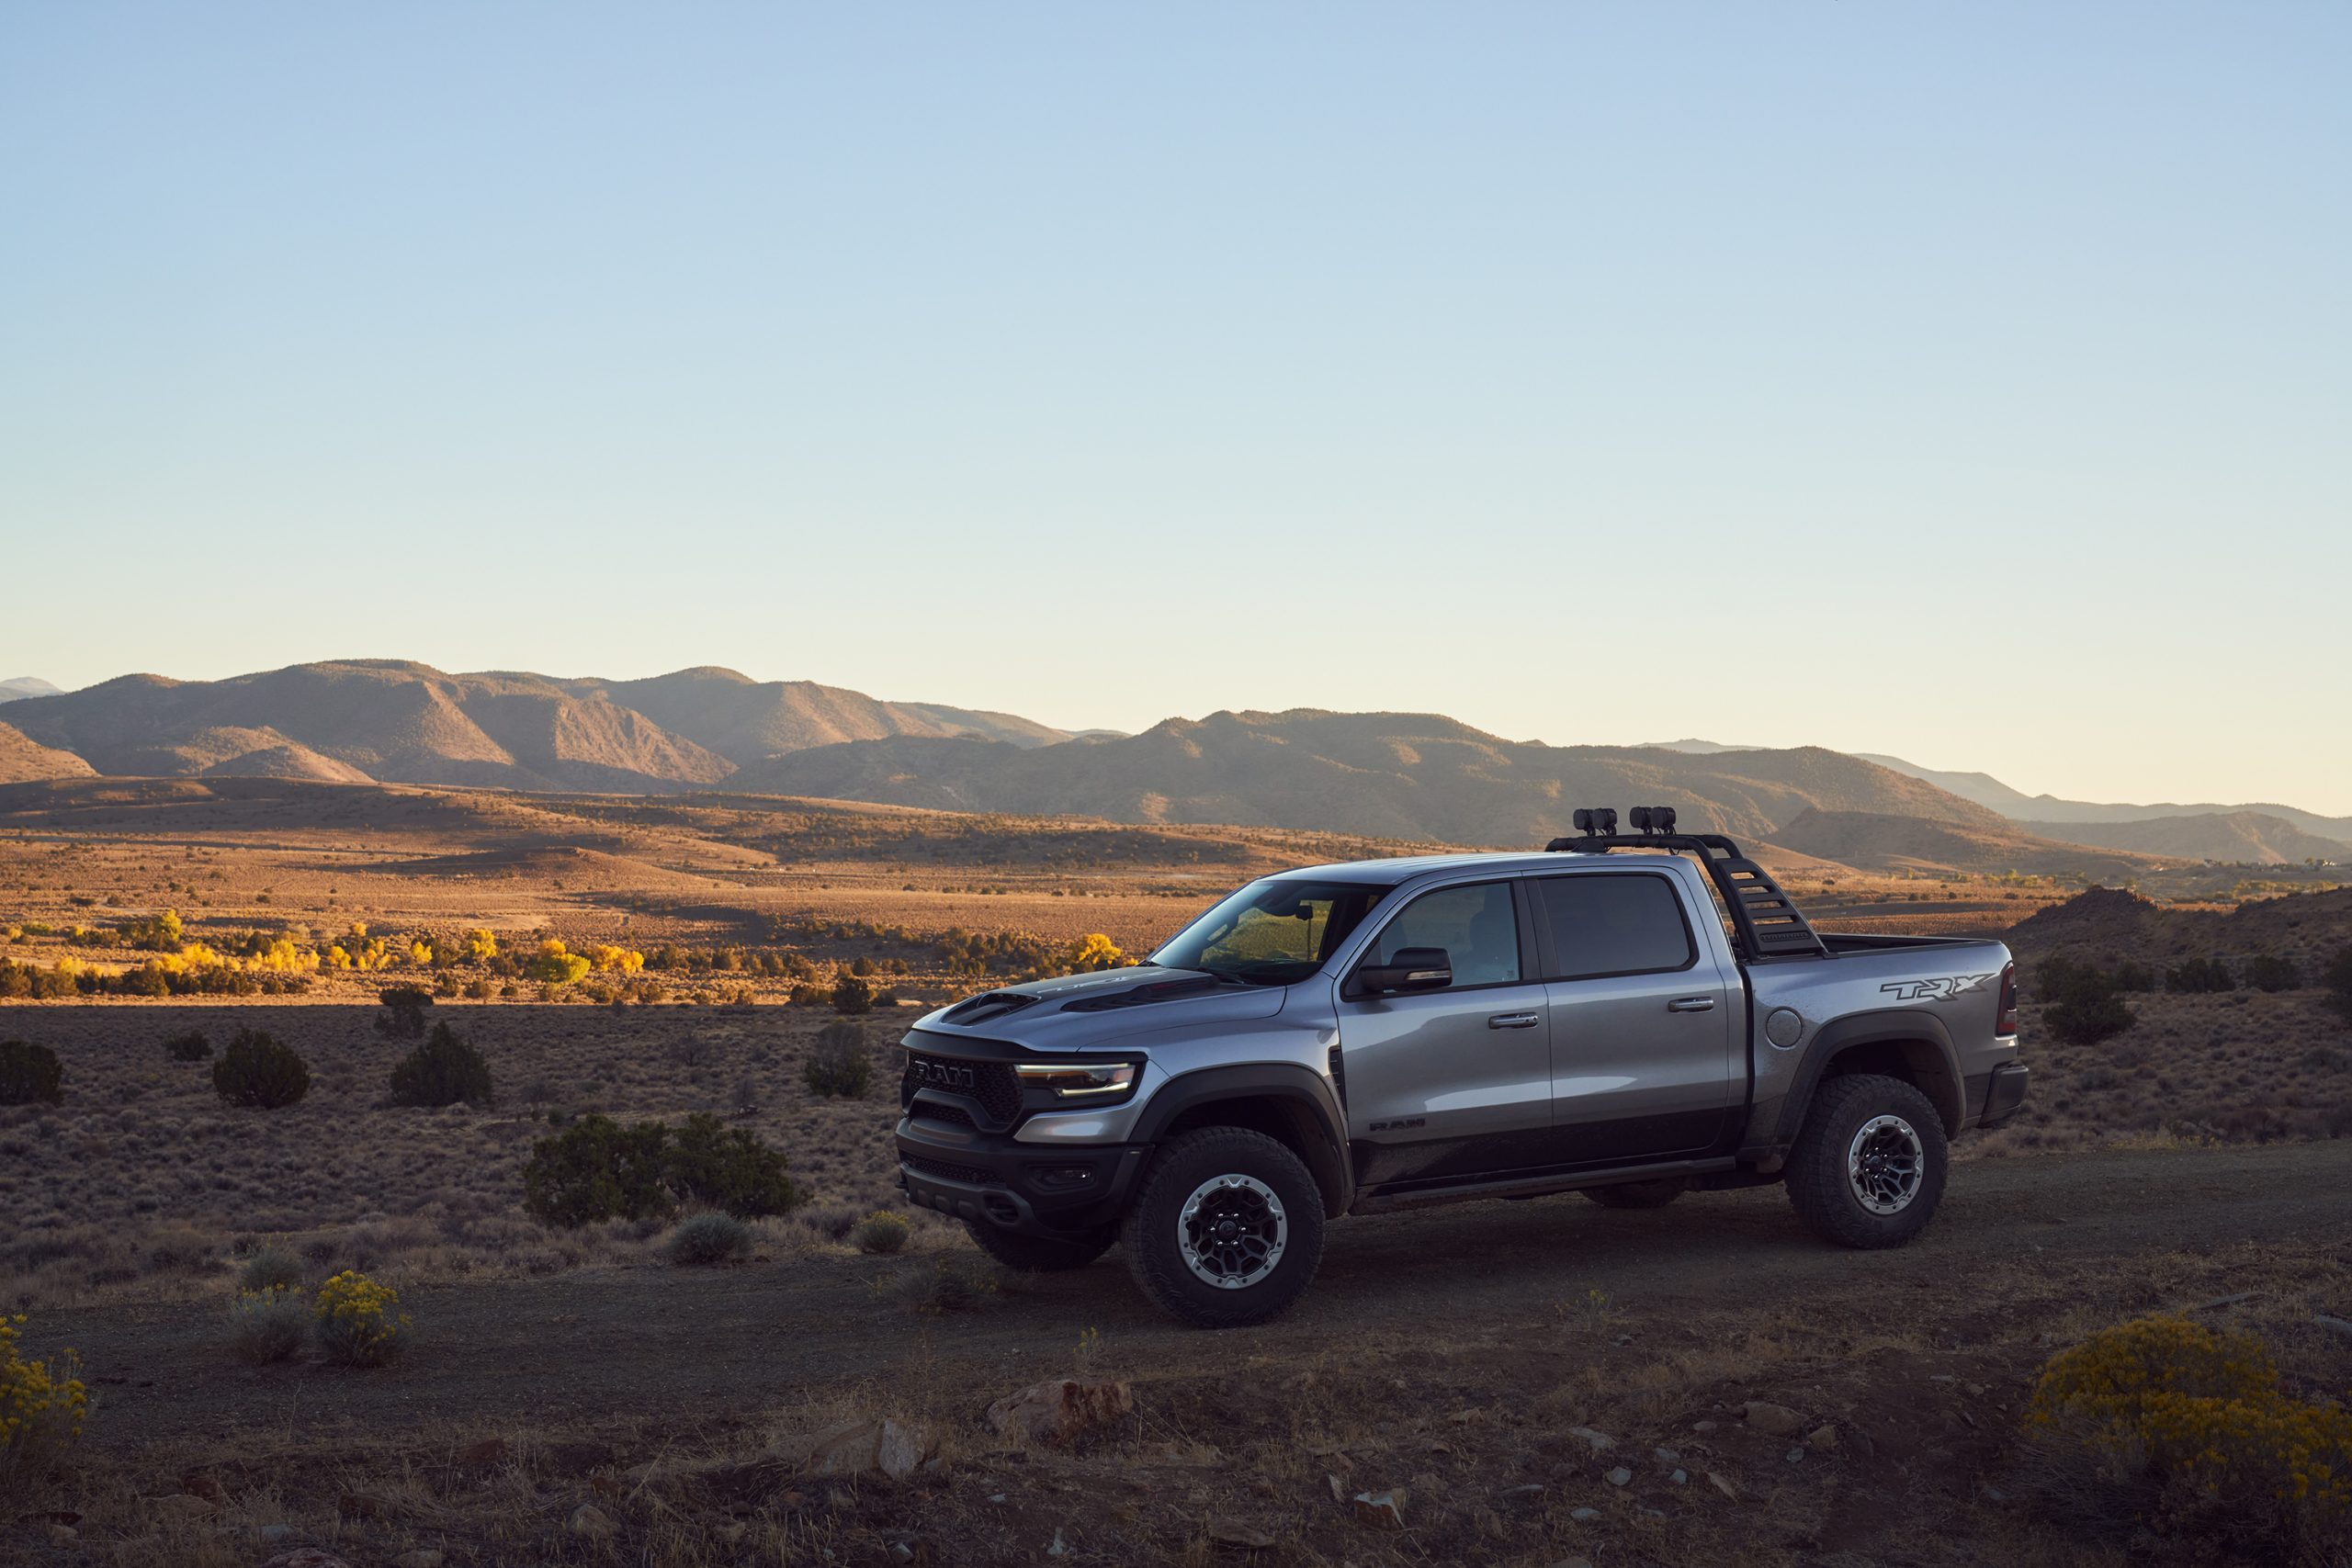 2021 Ram 1500 TRX front three-quarter mountain range backdrop